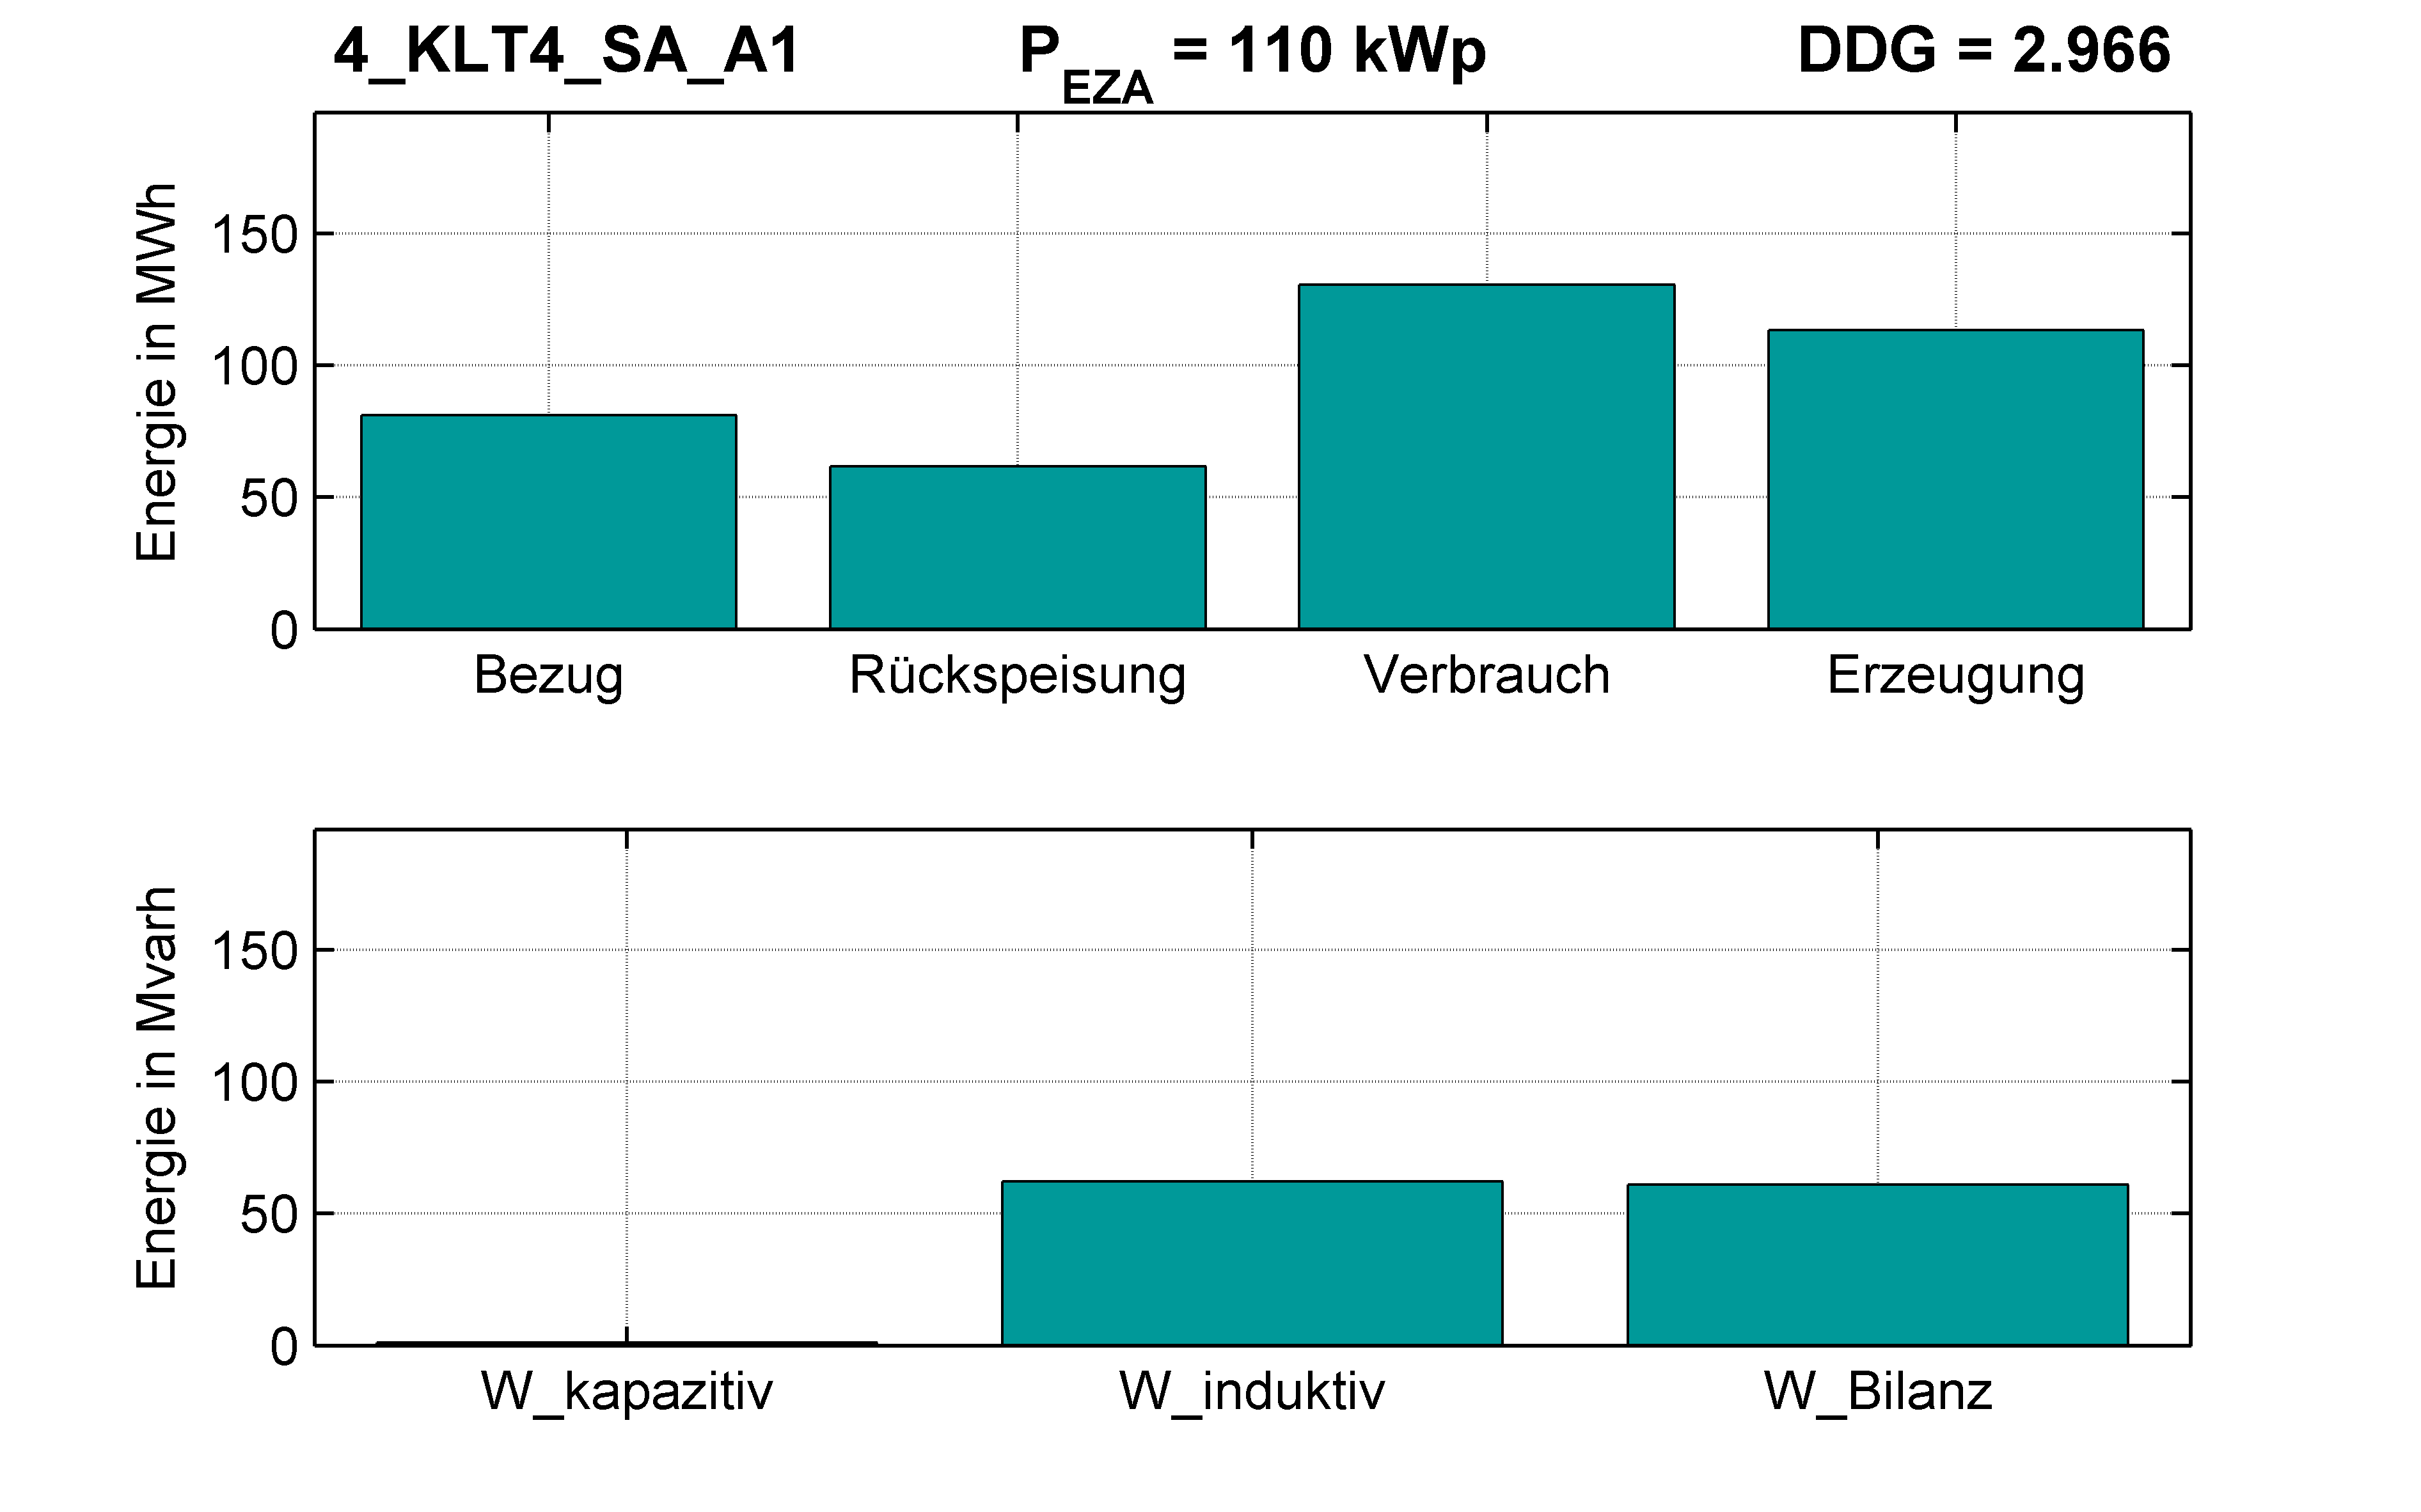 KLT4 | P-Kappung 55% (SA) A1 | PQ-Bilanz